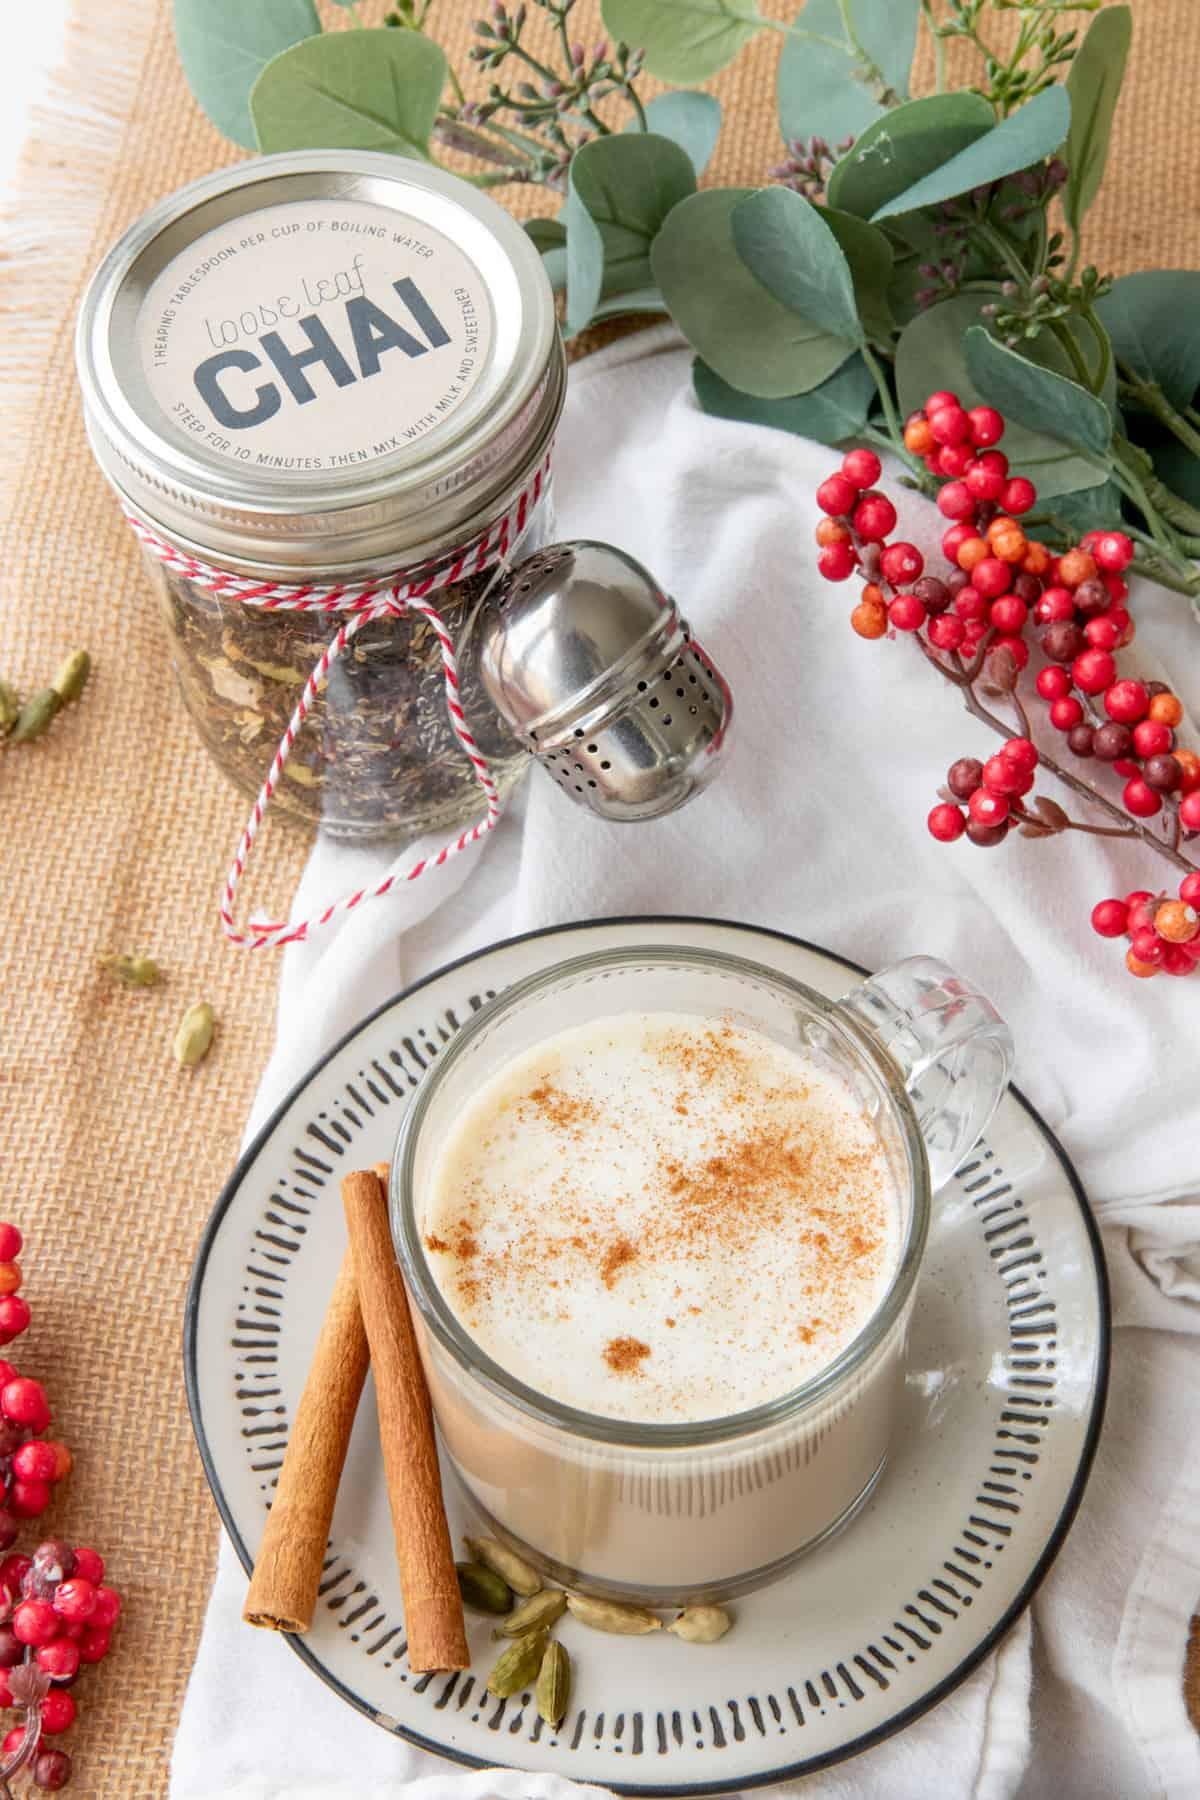 A glass mug filled with a chai latte sits next to a jar of loose leaf chai mix.